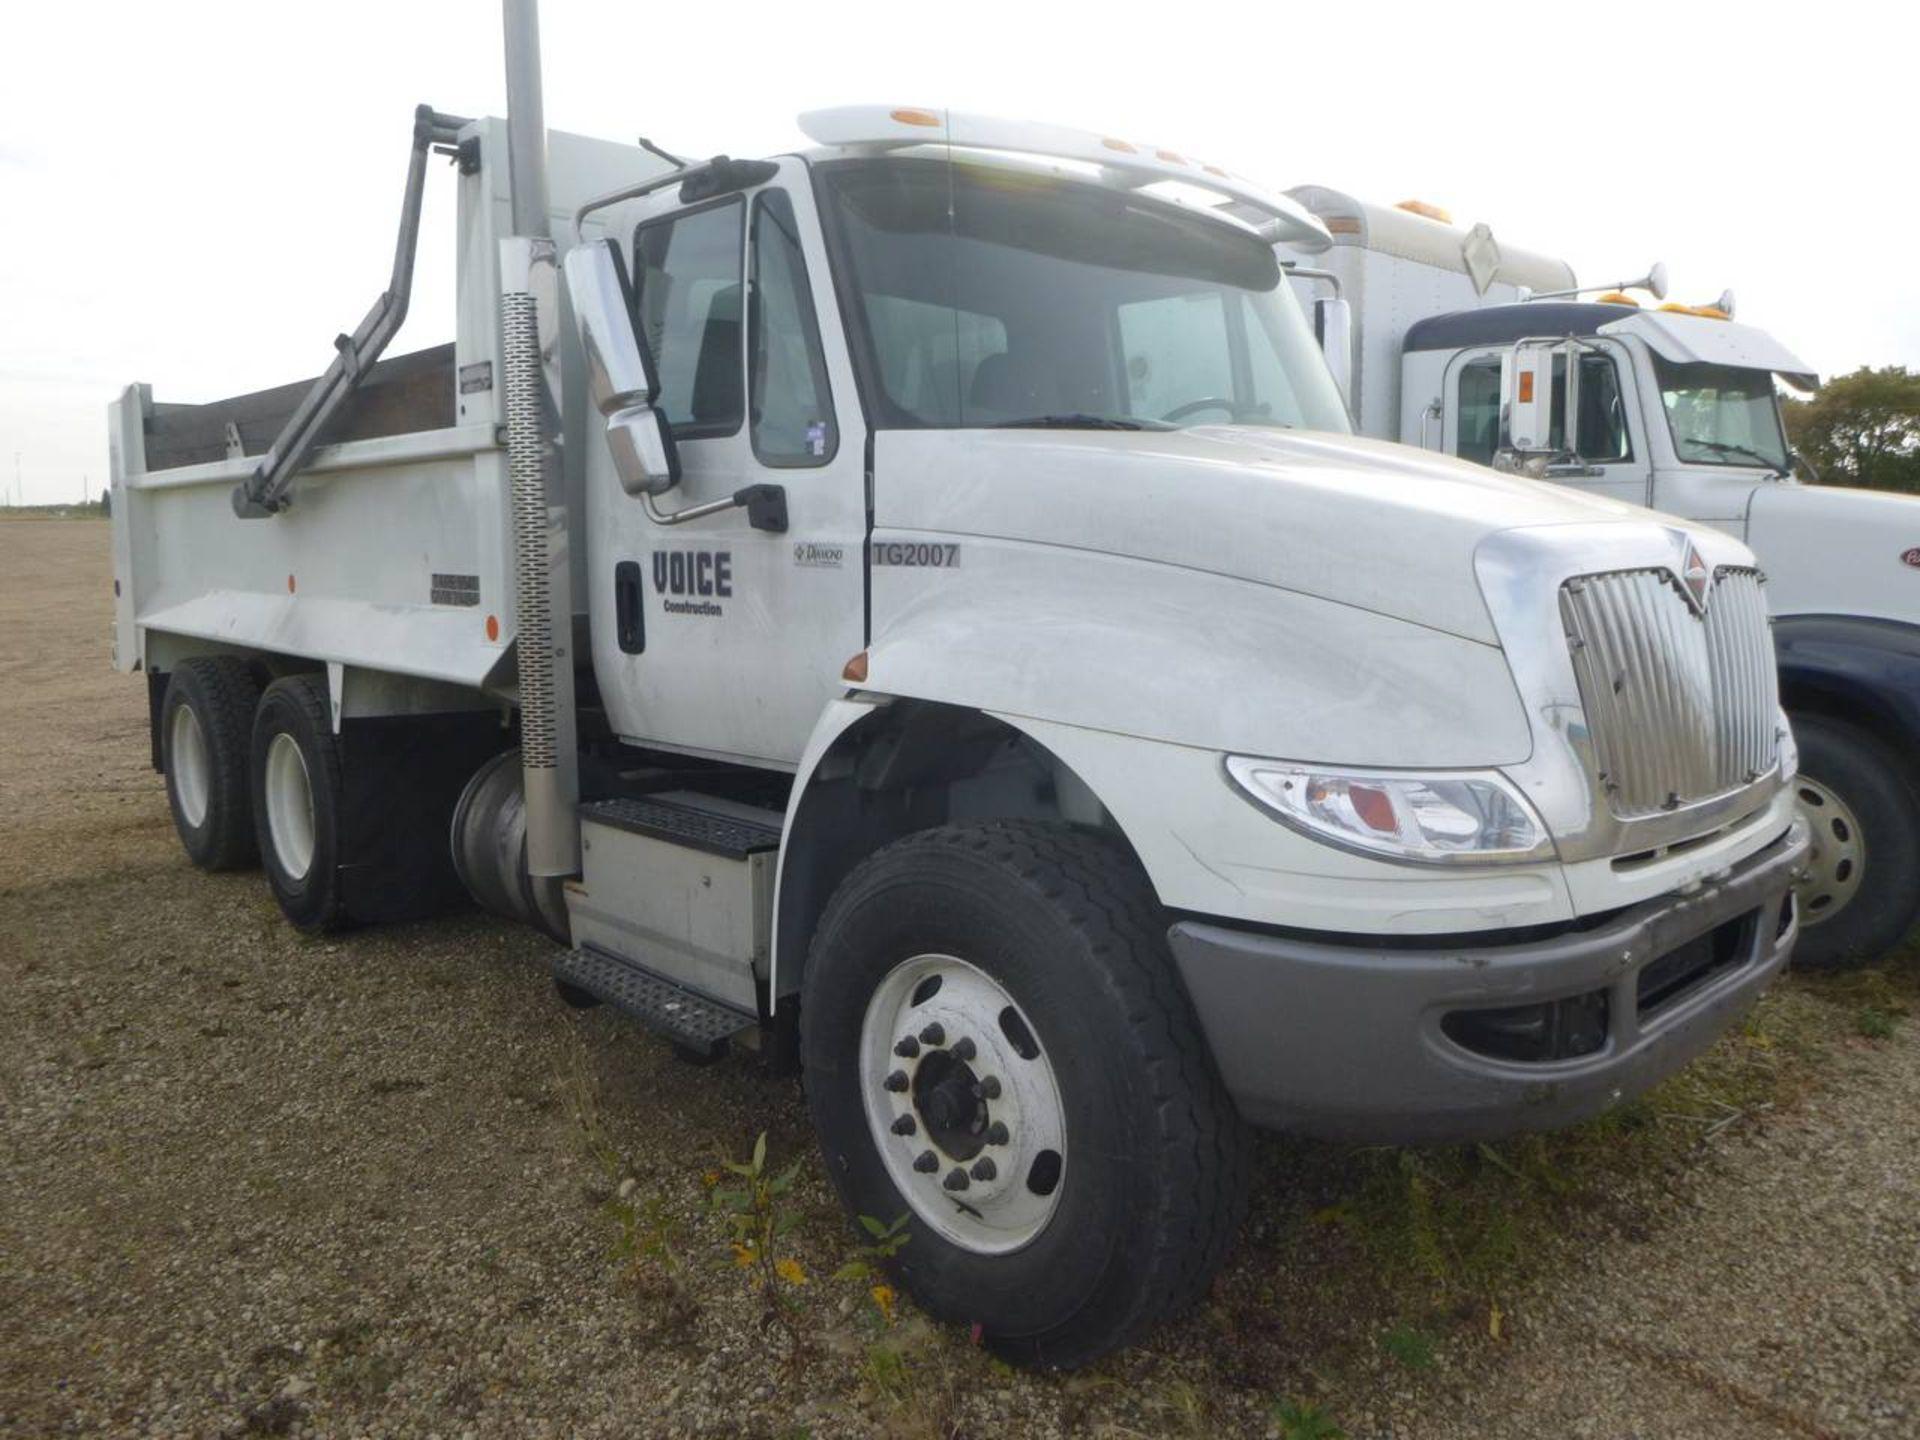 2018 International 4400 SBA 6X4 Dump Truck - Image 2 of 15